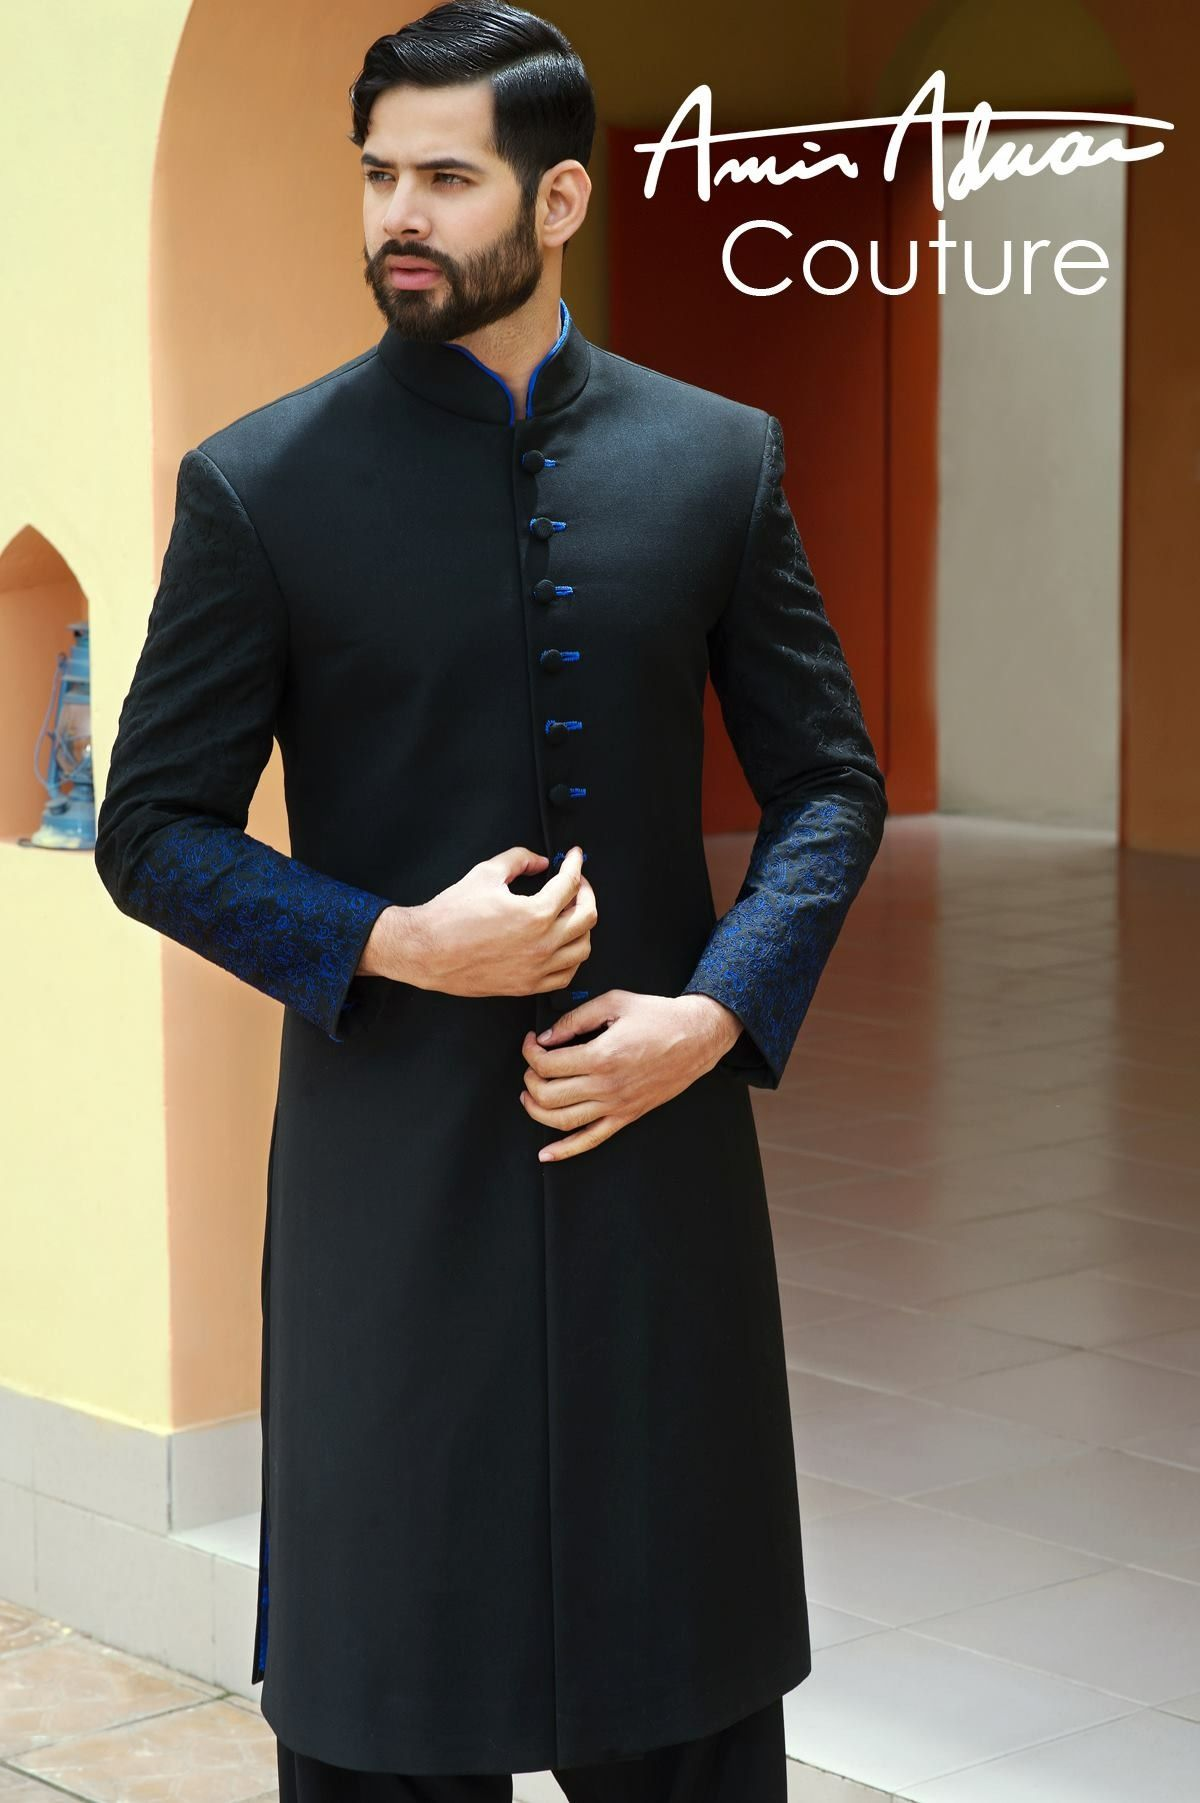 Pin by Muhammad Awais on Groom Dress | Pinterest | Groom dress